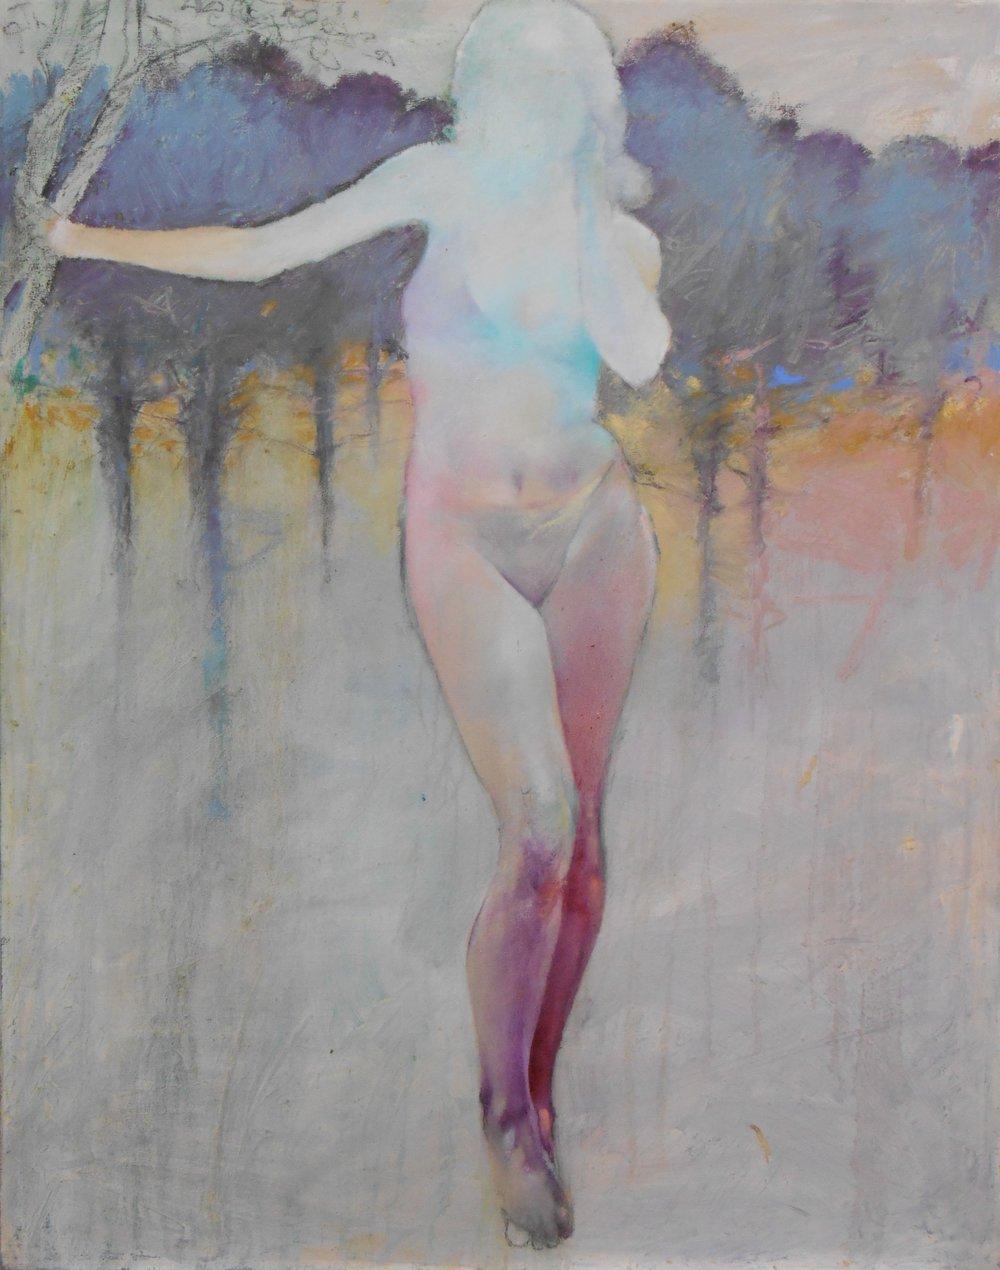 Past 1.Spring_Oil Pastel on Canvas_2003_50x44 Yu Ming Zhu 2015.JPG